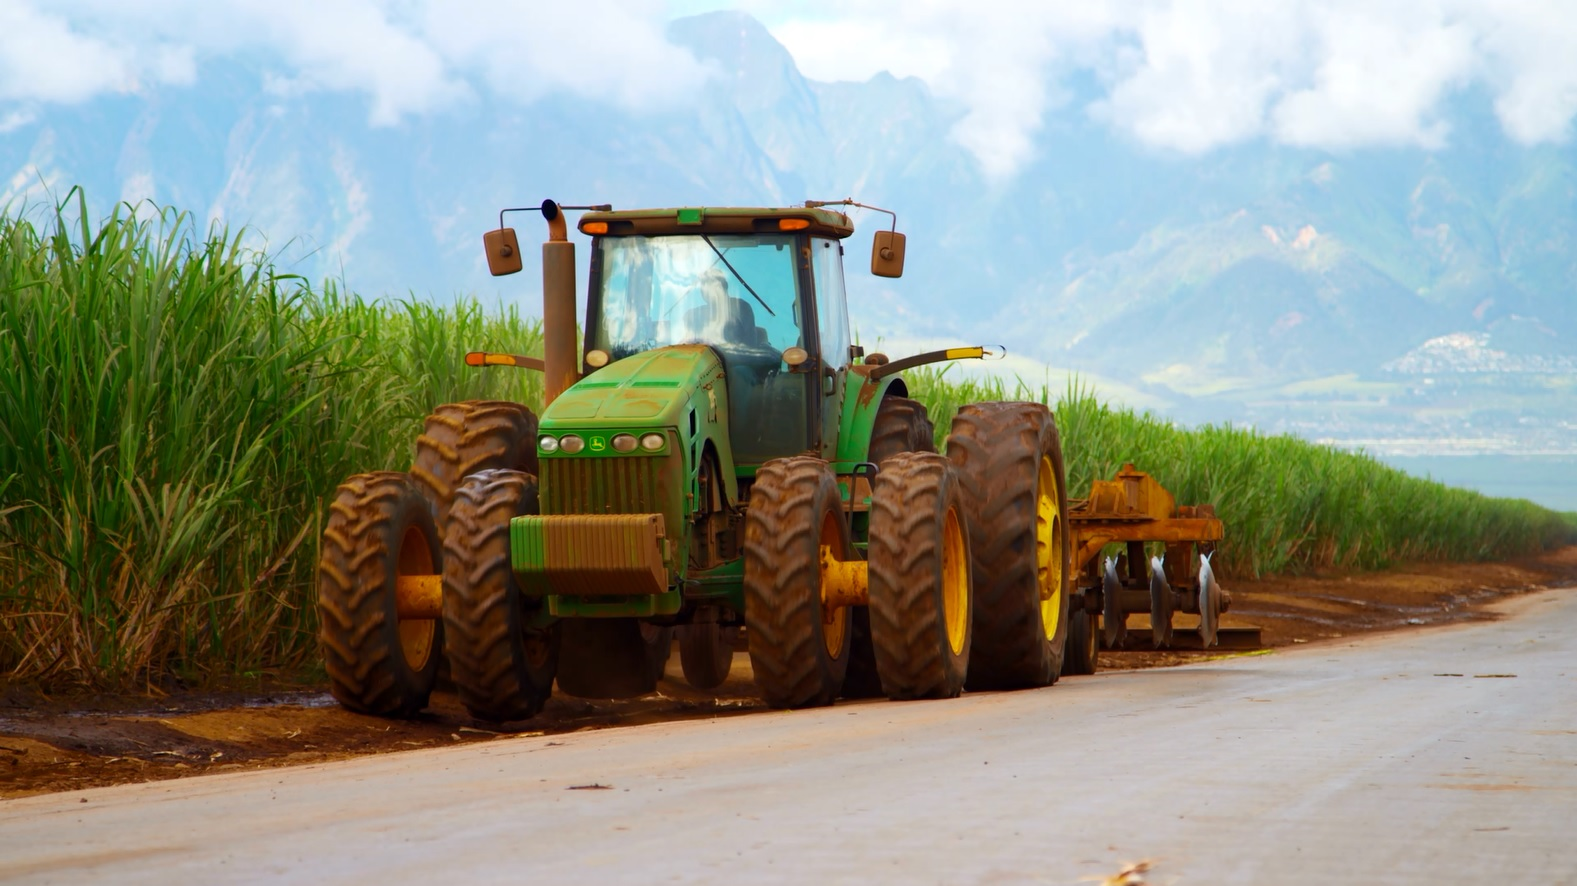 hcands sugar plantation alexander baldwin sugarcane field tractor maui_137238